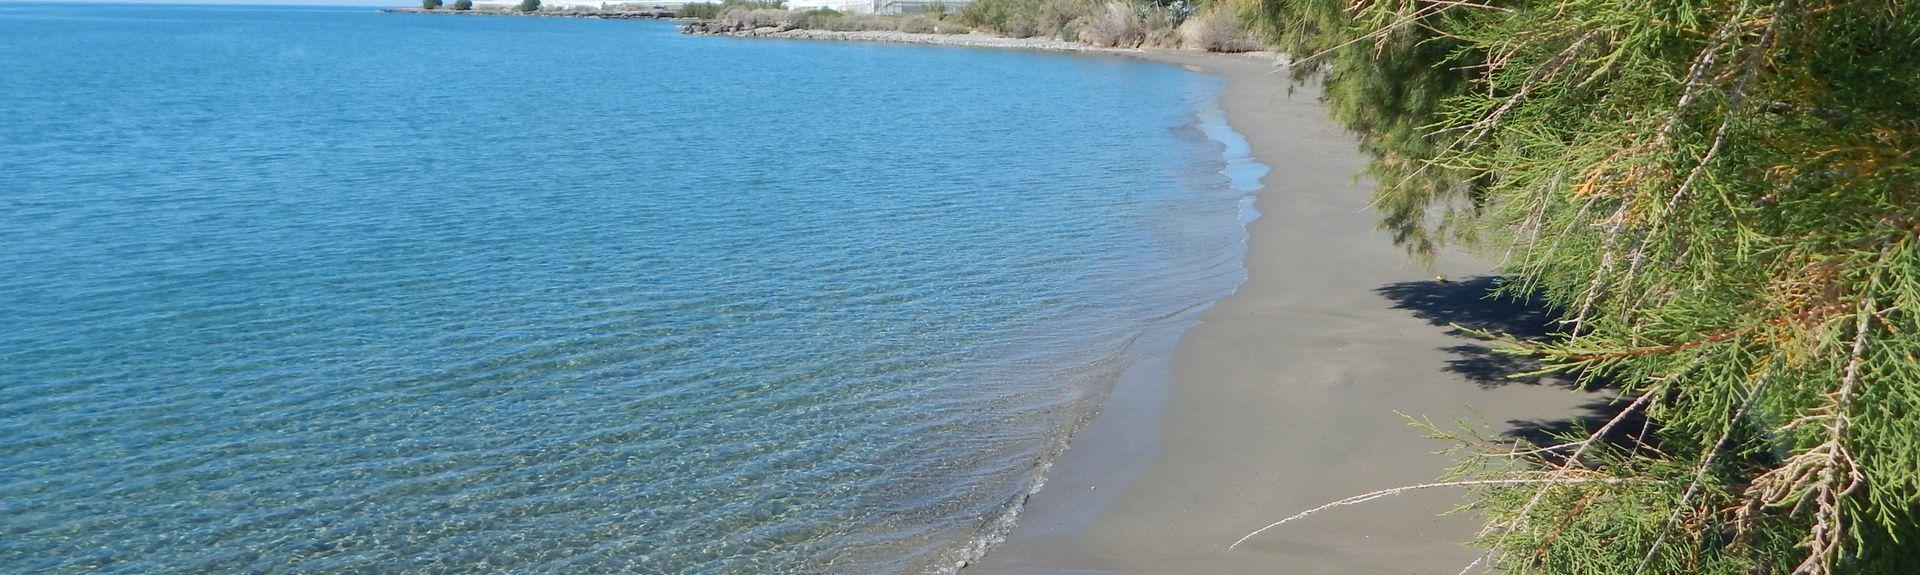 Agios Nikolaos, Kreta, Griechenland